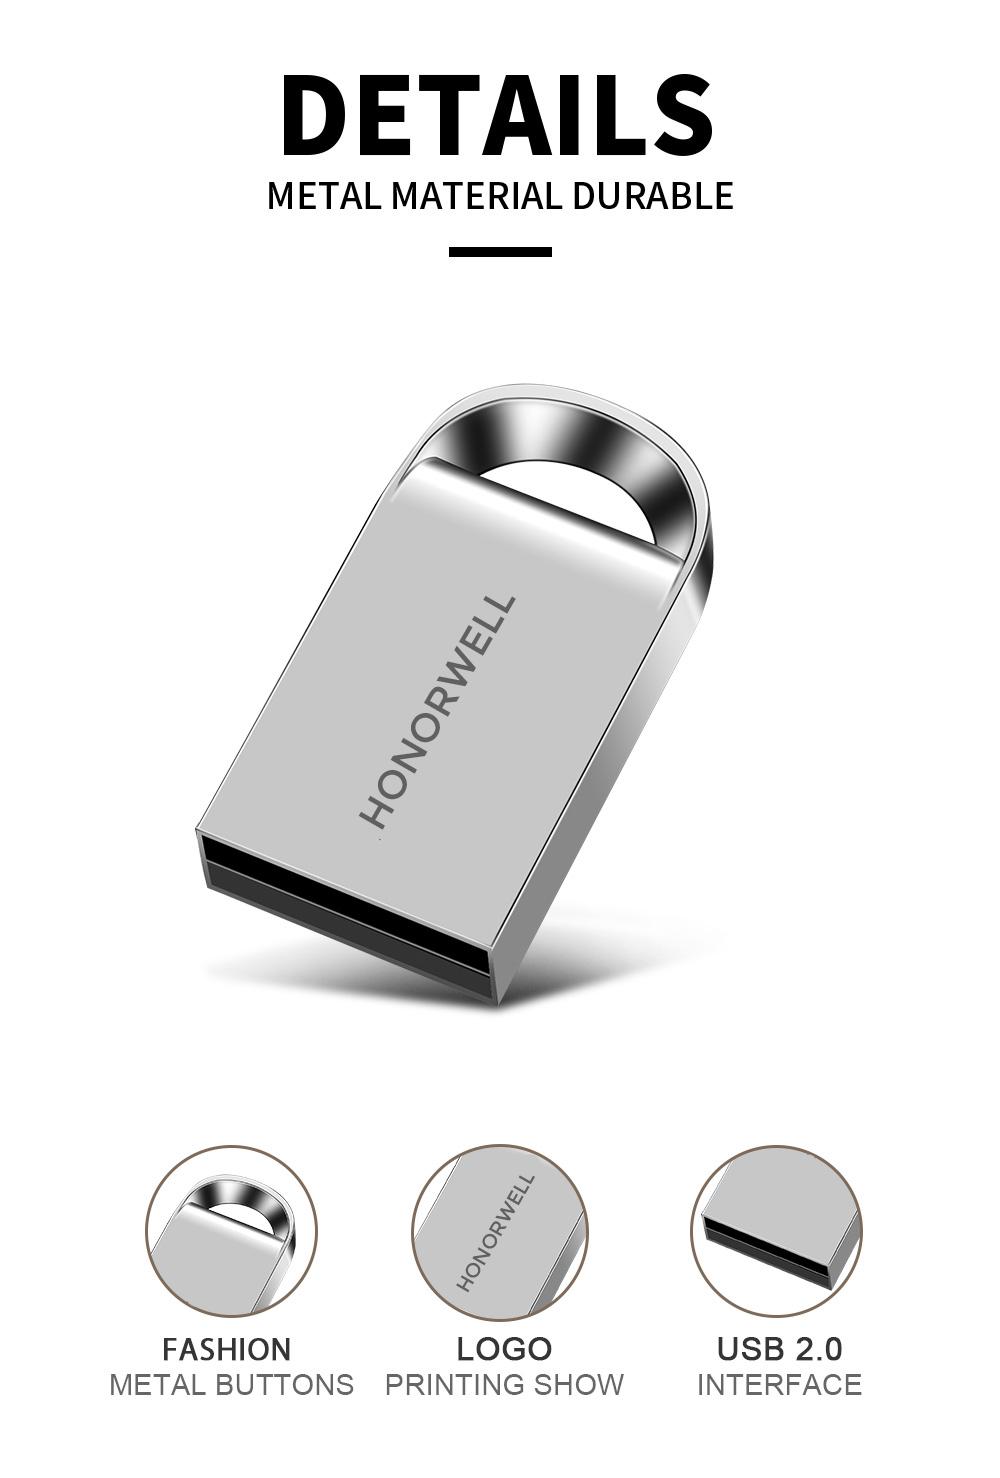 Free Sample USB Flash Drive Promotion Gift USB Pen Drive Metal usb flash drive 128gb Customize LOGO